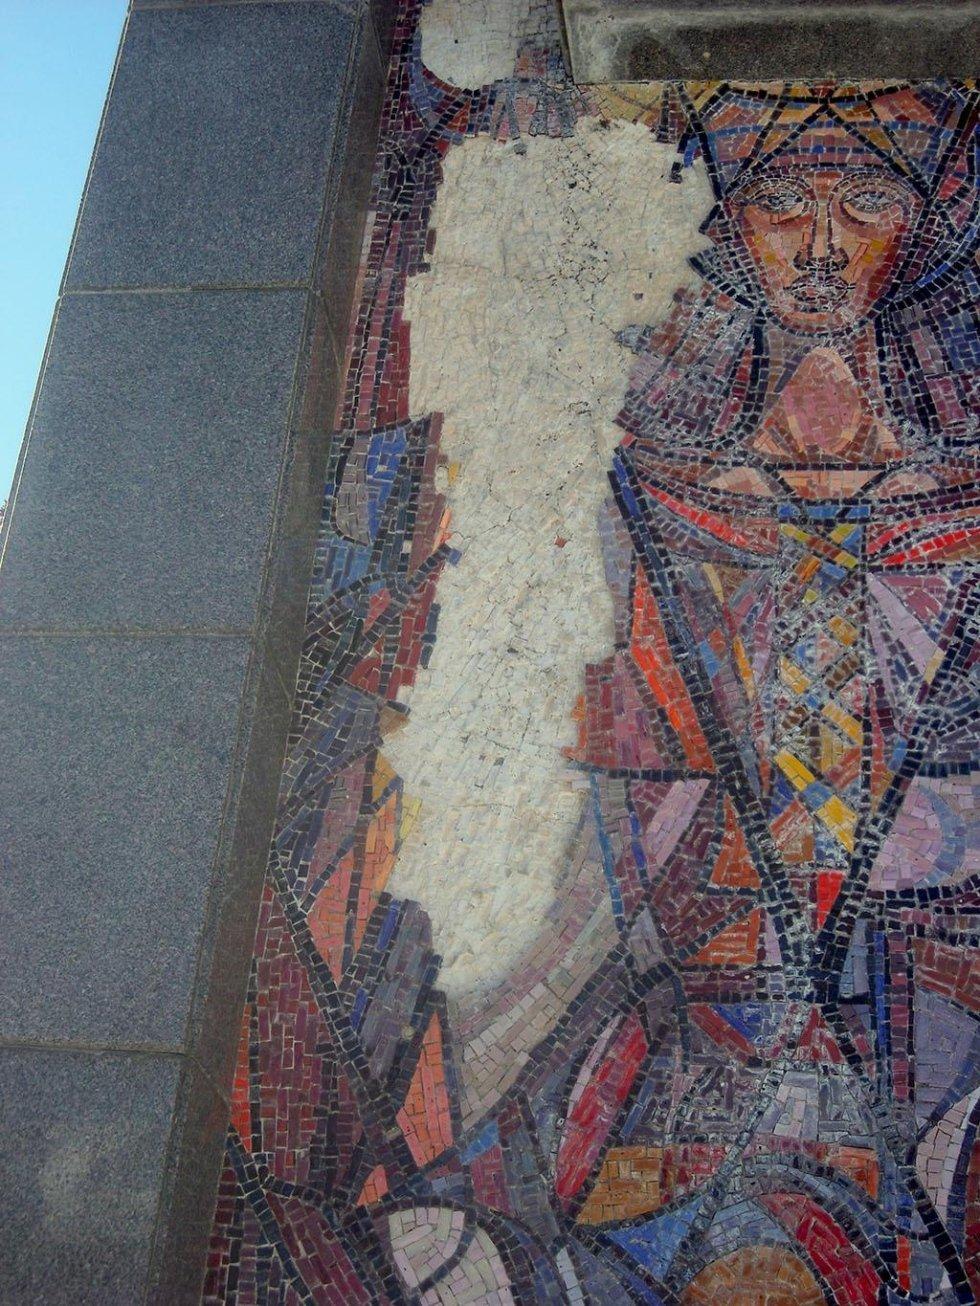 Restauro mosaico Cappella Cimiteriale Sondalo